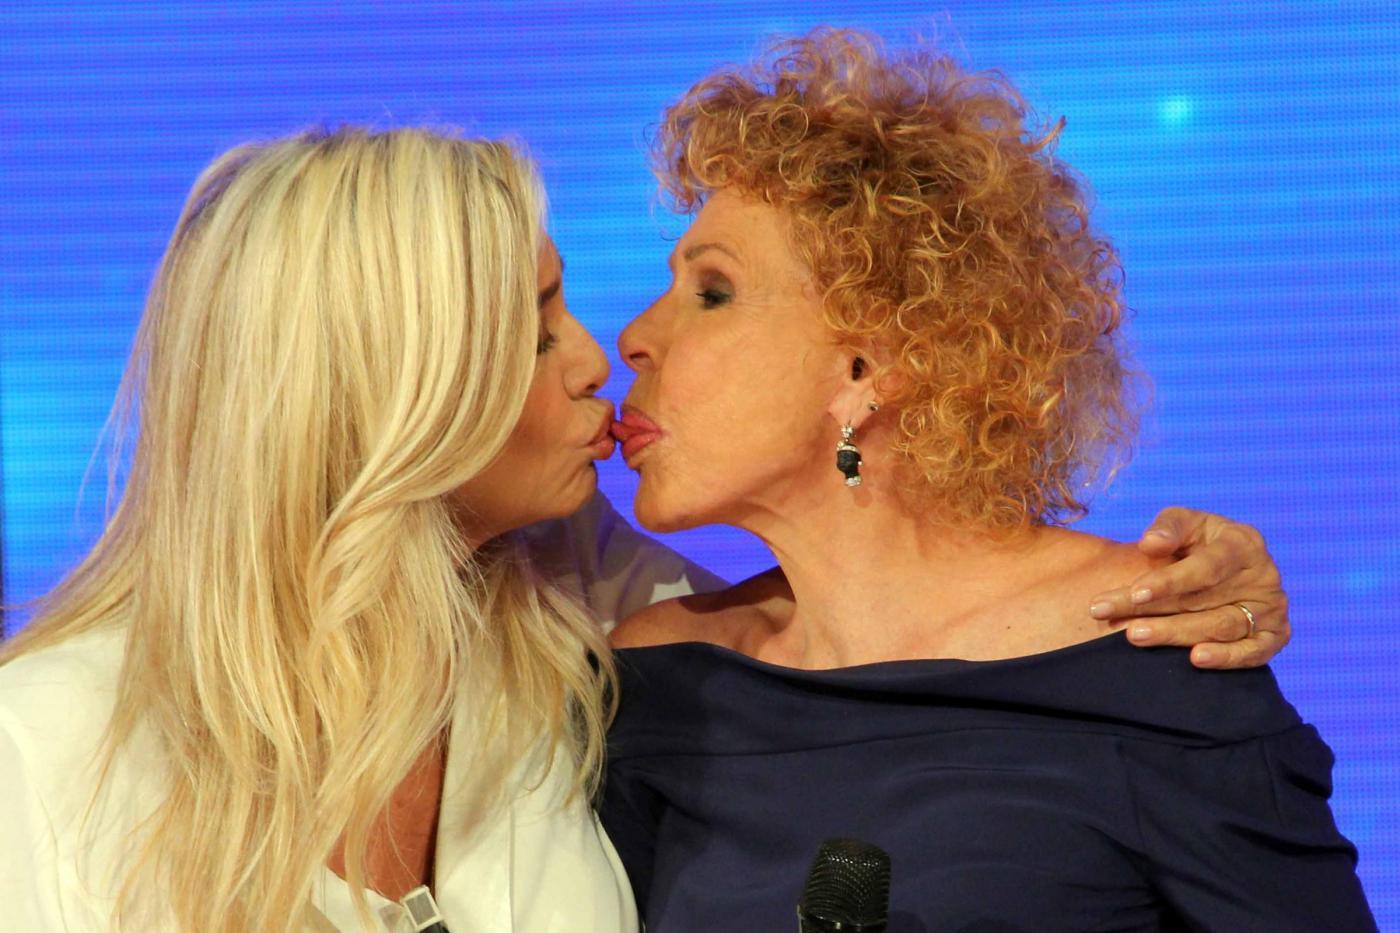 porno lesbico belen rodriguez porno